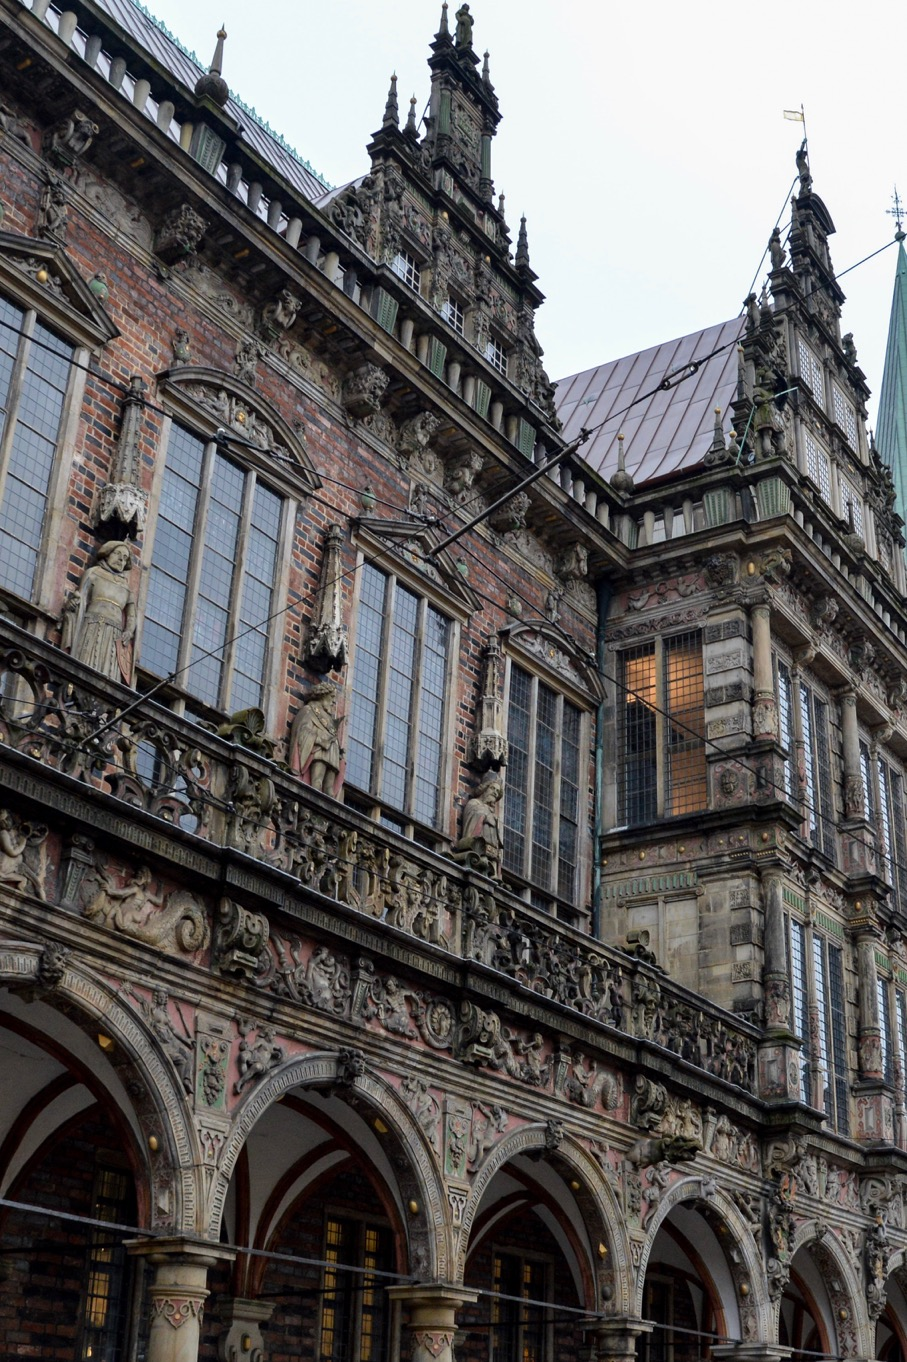 Bremer Rathaus; Bremen Town Hall; Bremen, Germany